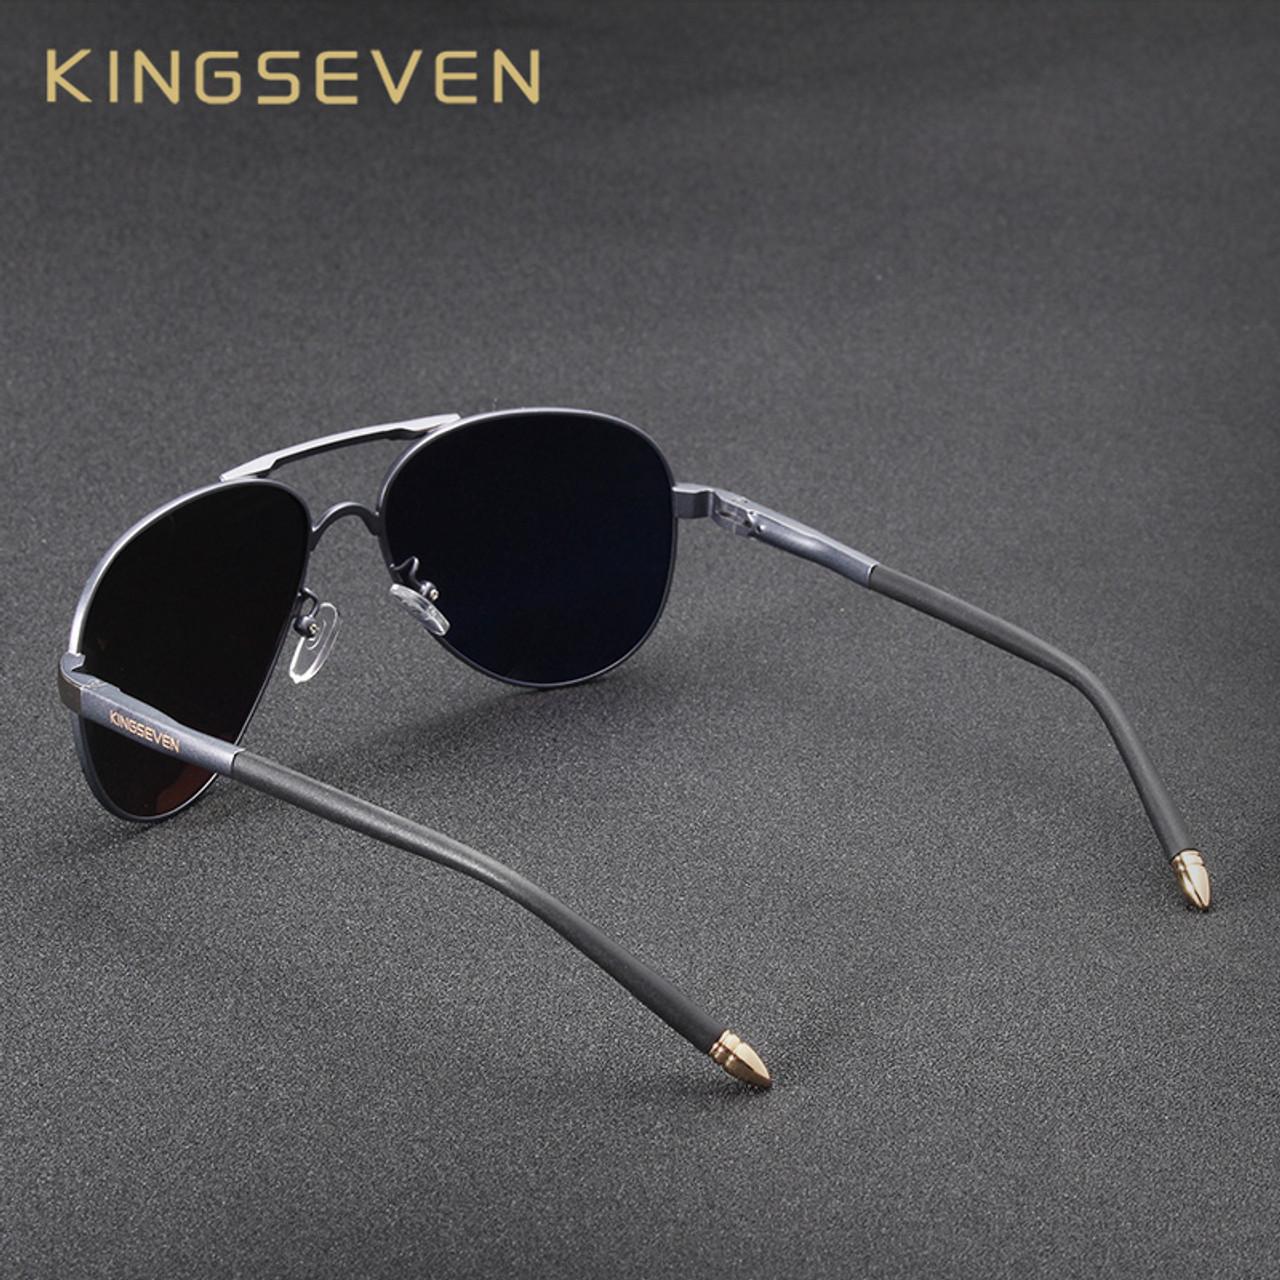 3faeddd72eb ... KINGSEVEN Brand New Unisex Aluminum Polarized Sunglasses Women Men  Design Travel Driving Sun Glasses Classic Male ...